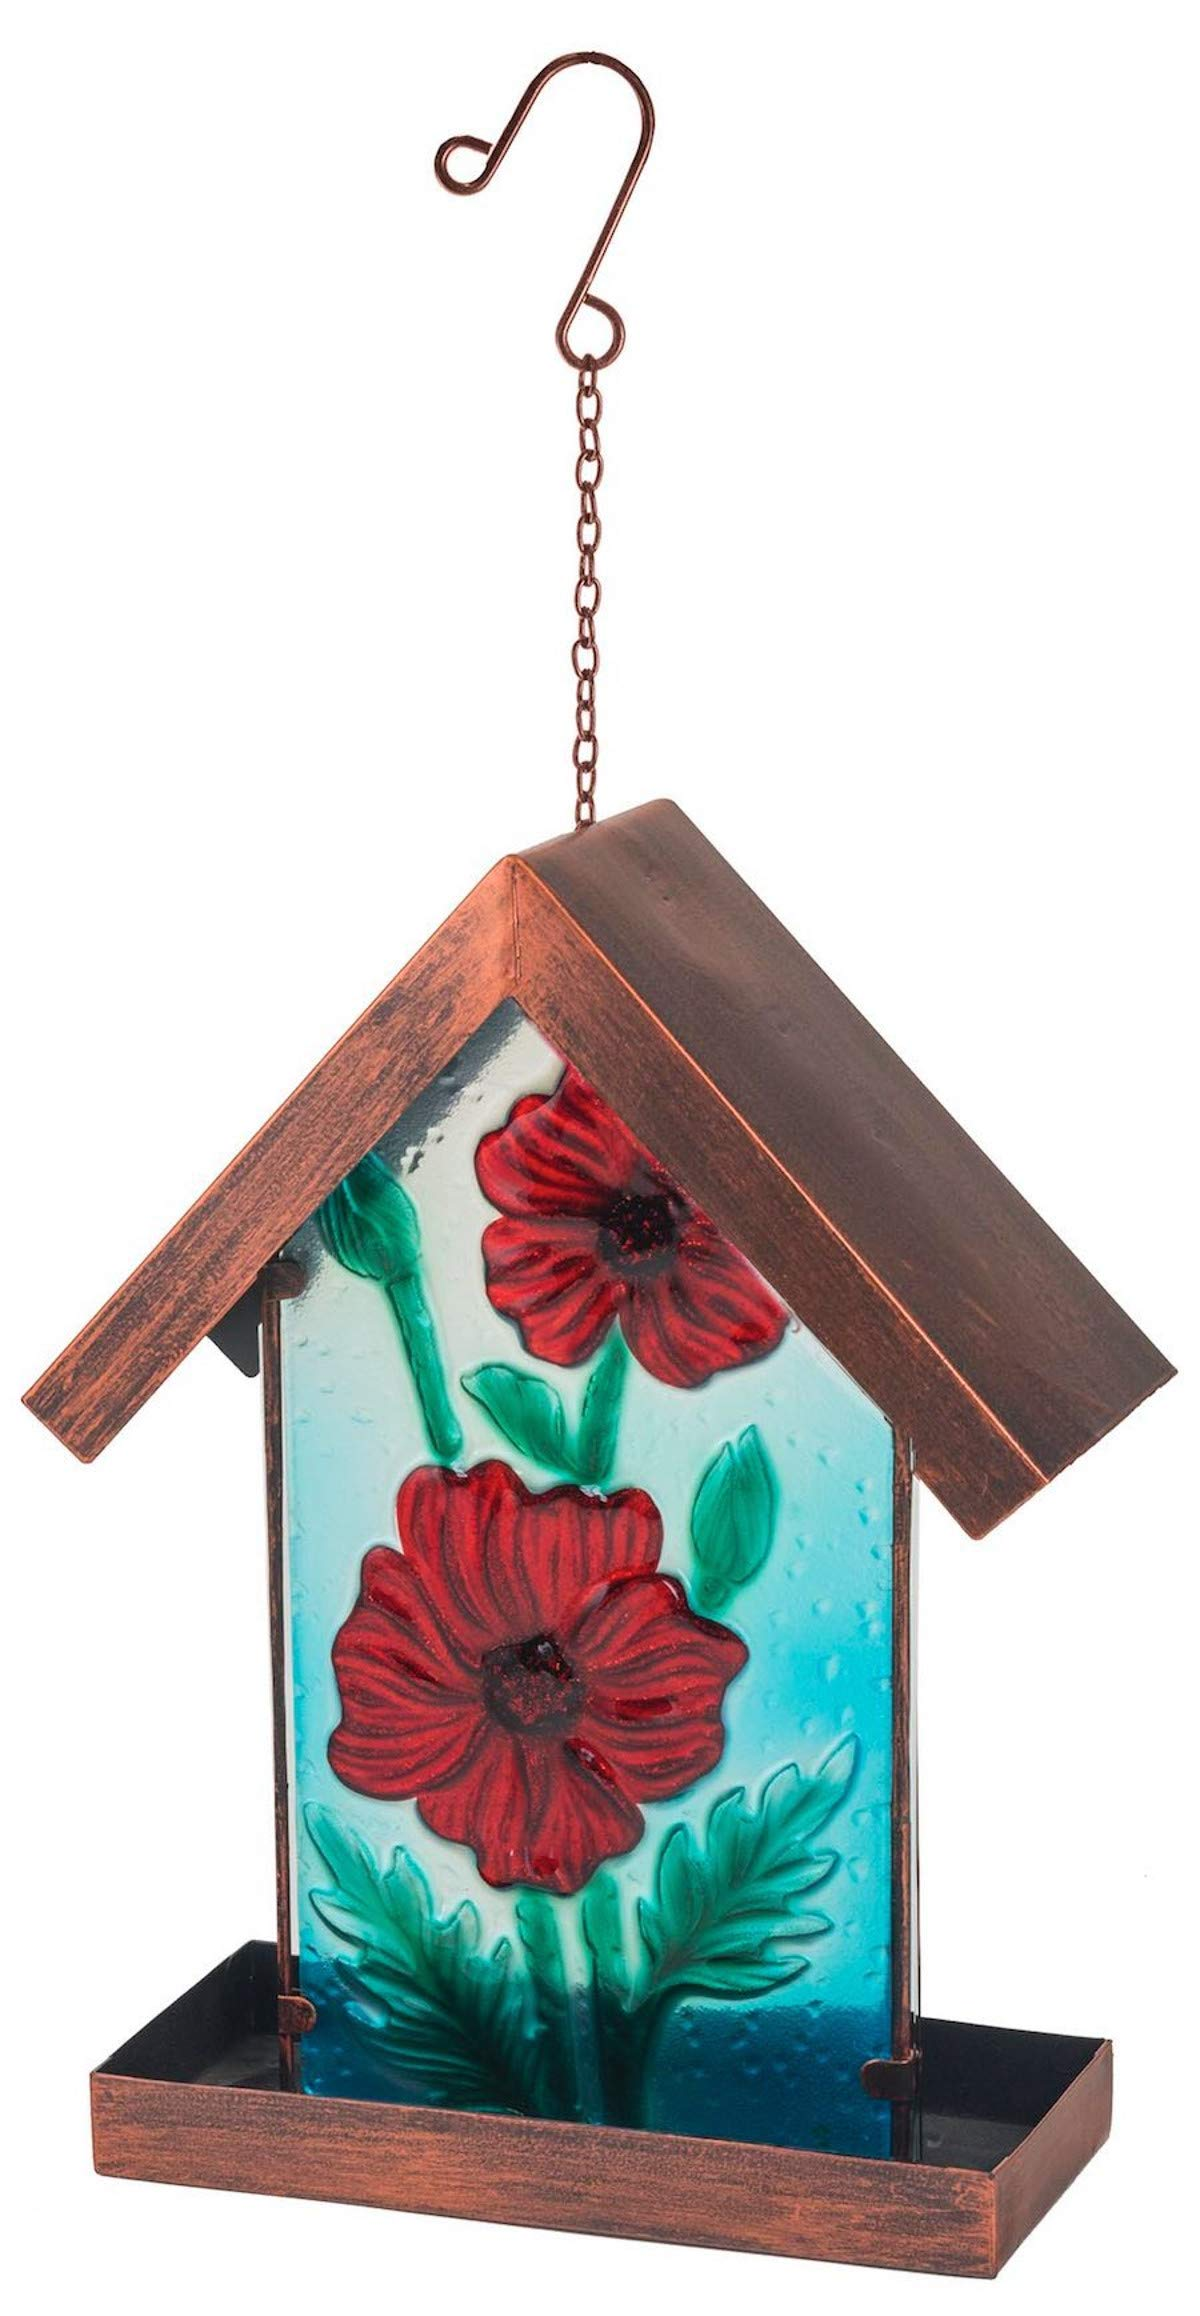 Bronze bird feeding station table seed or peanut Decorative Garden Ornament Garden mile/® Unique Vintage Style Cast Iron Heavy Duty Hanging Bird Feeder Or Bath